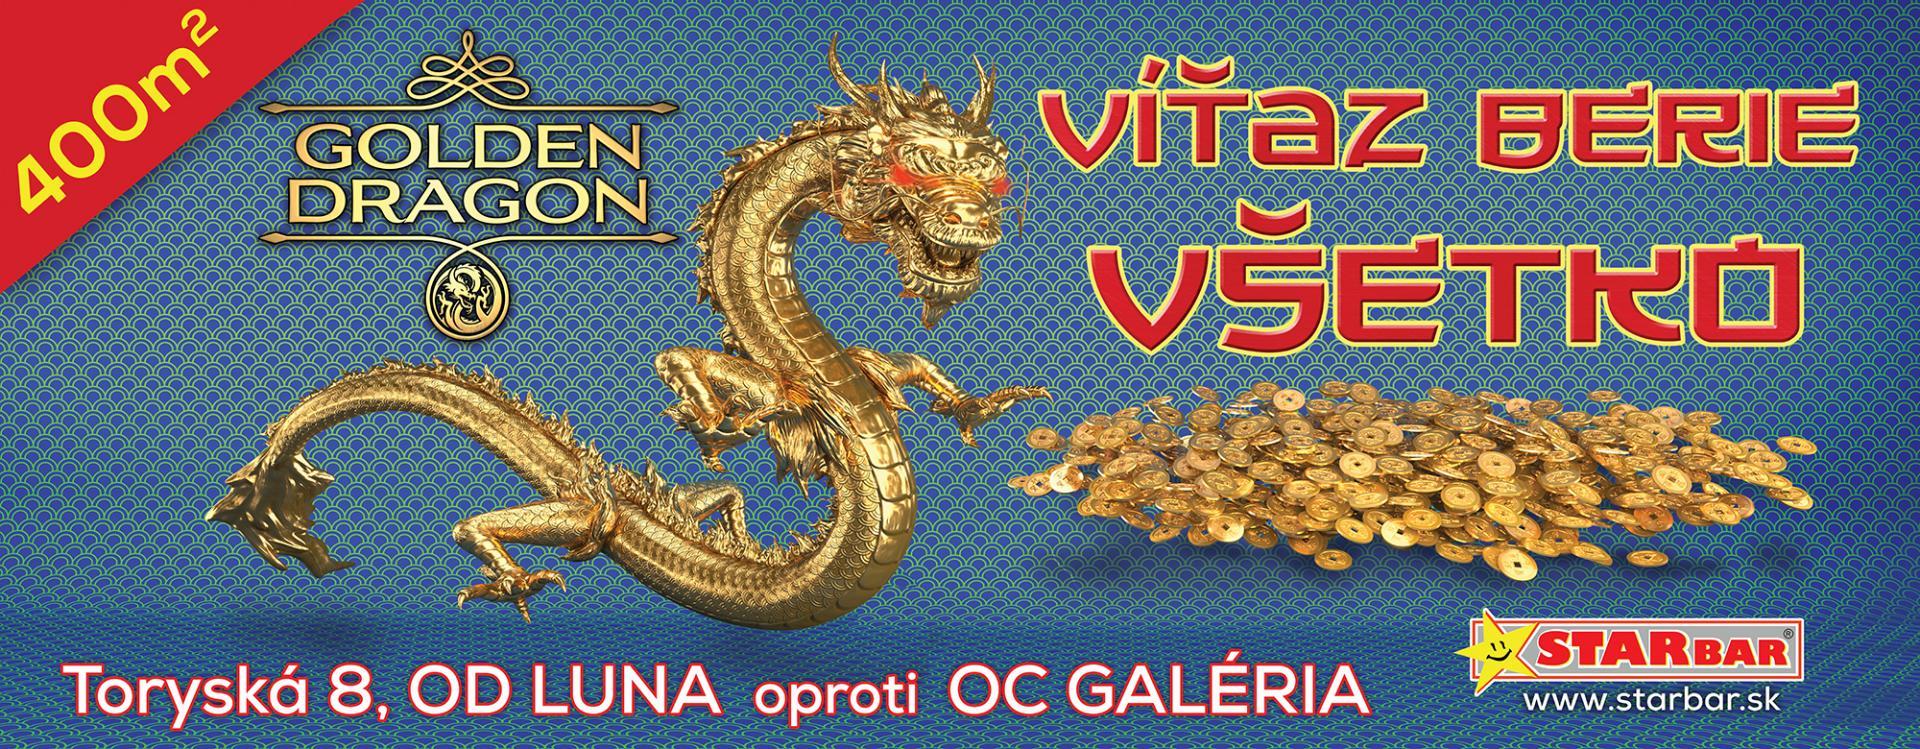 Herňa Starbar Golden Dragon KE oproti OC Galéria